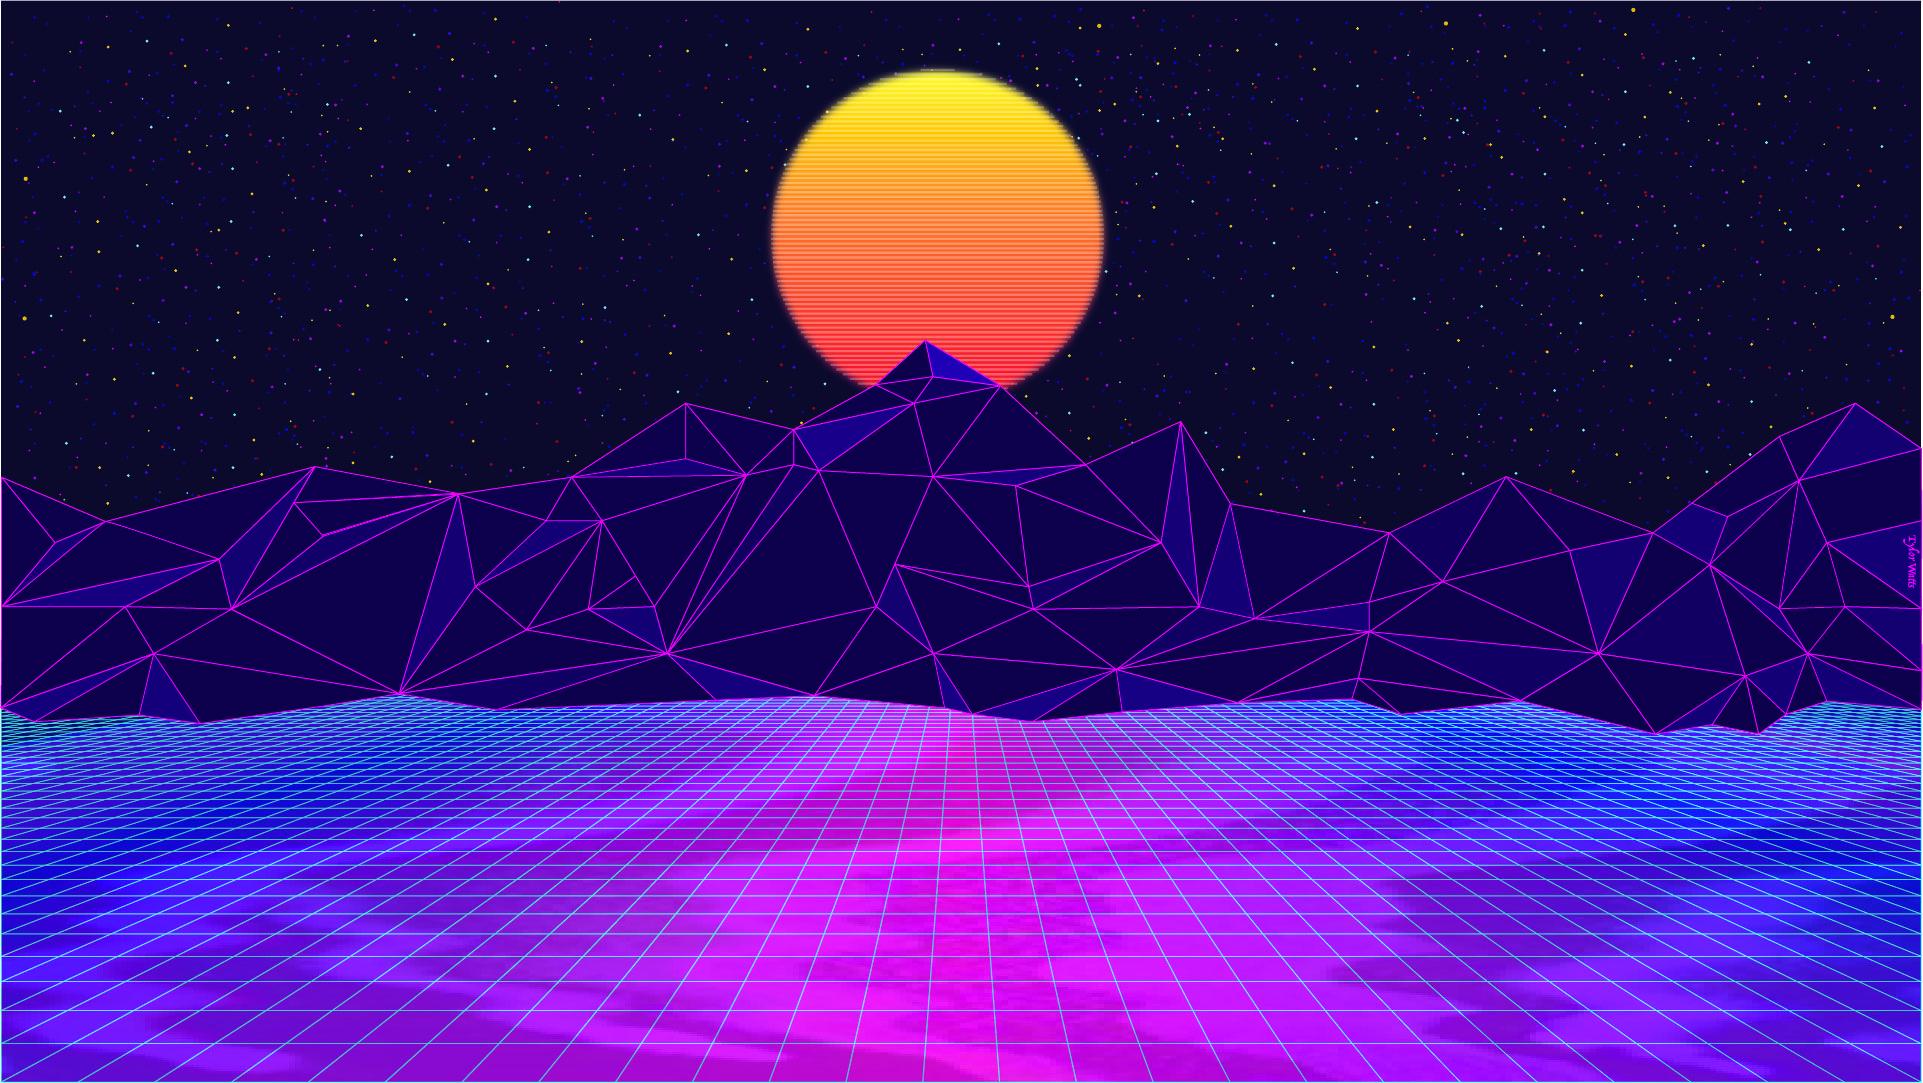 V A P O R W A V E Adobe Illustrator 1920x1080 Imgur Vaporwave Wallpaper Cute Desktop Wallpaper Desktop Wallpaper